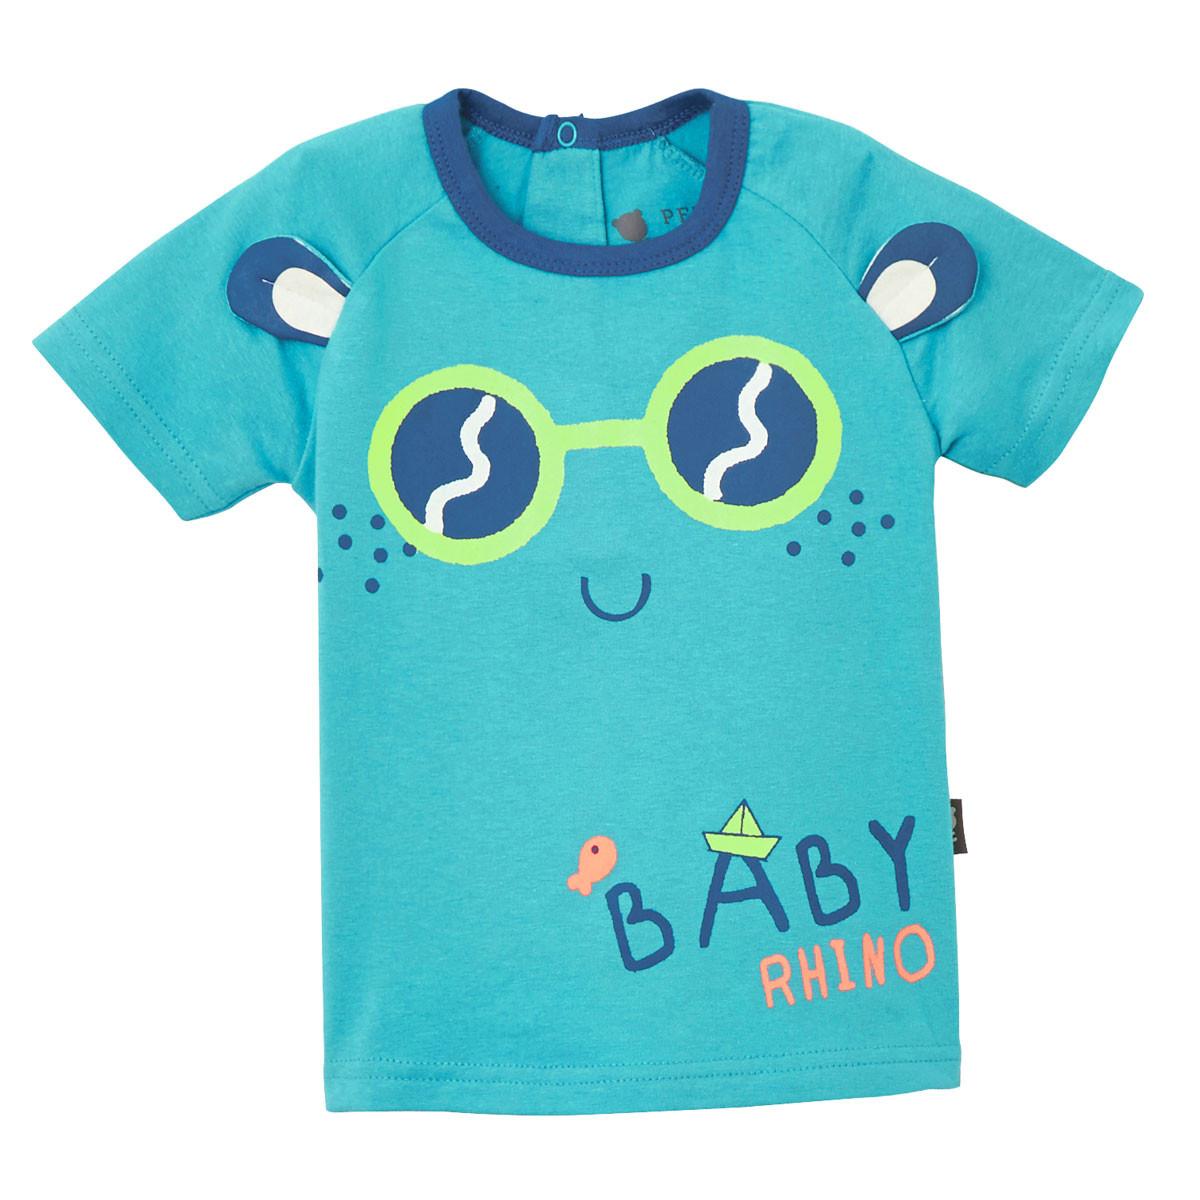 Tee-shirt bleu bébé Babyrhino